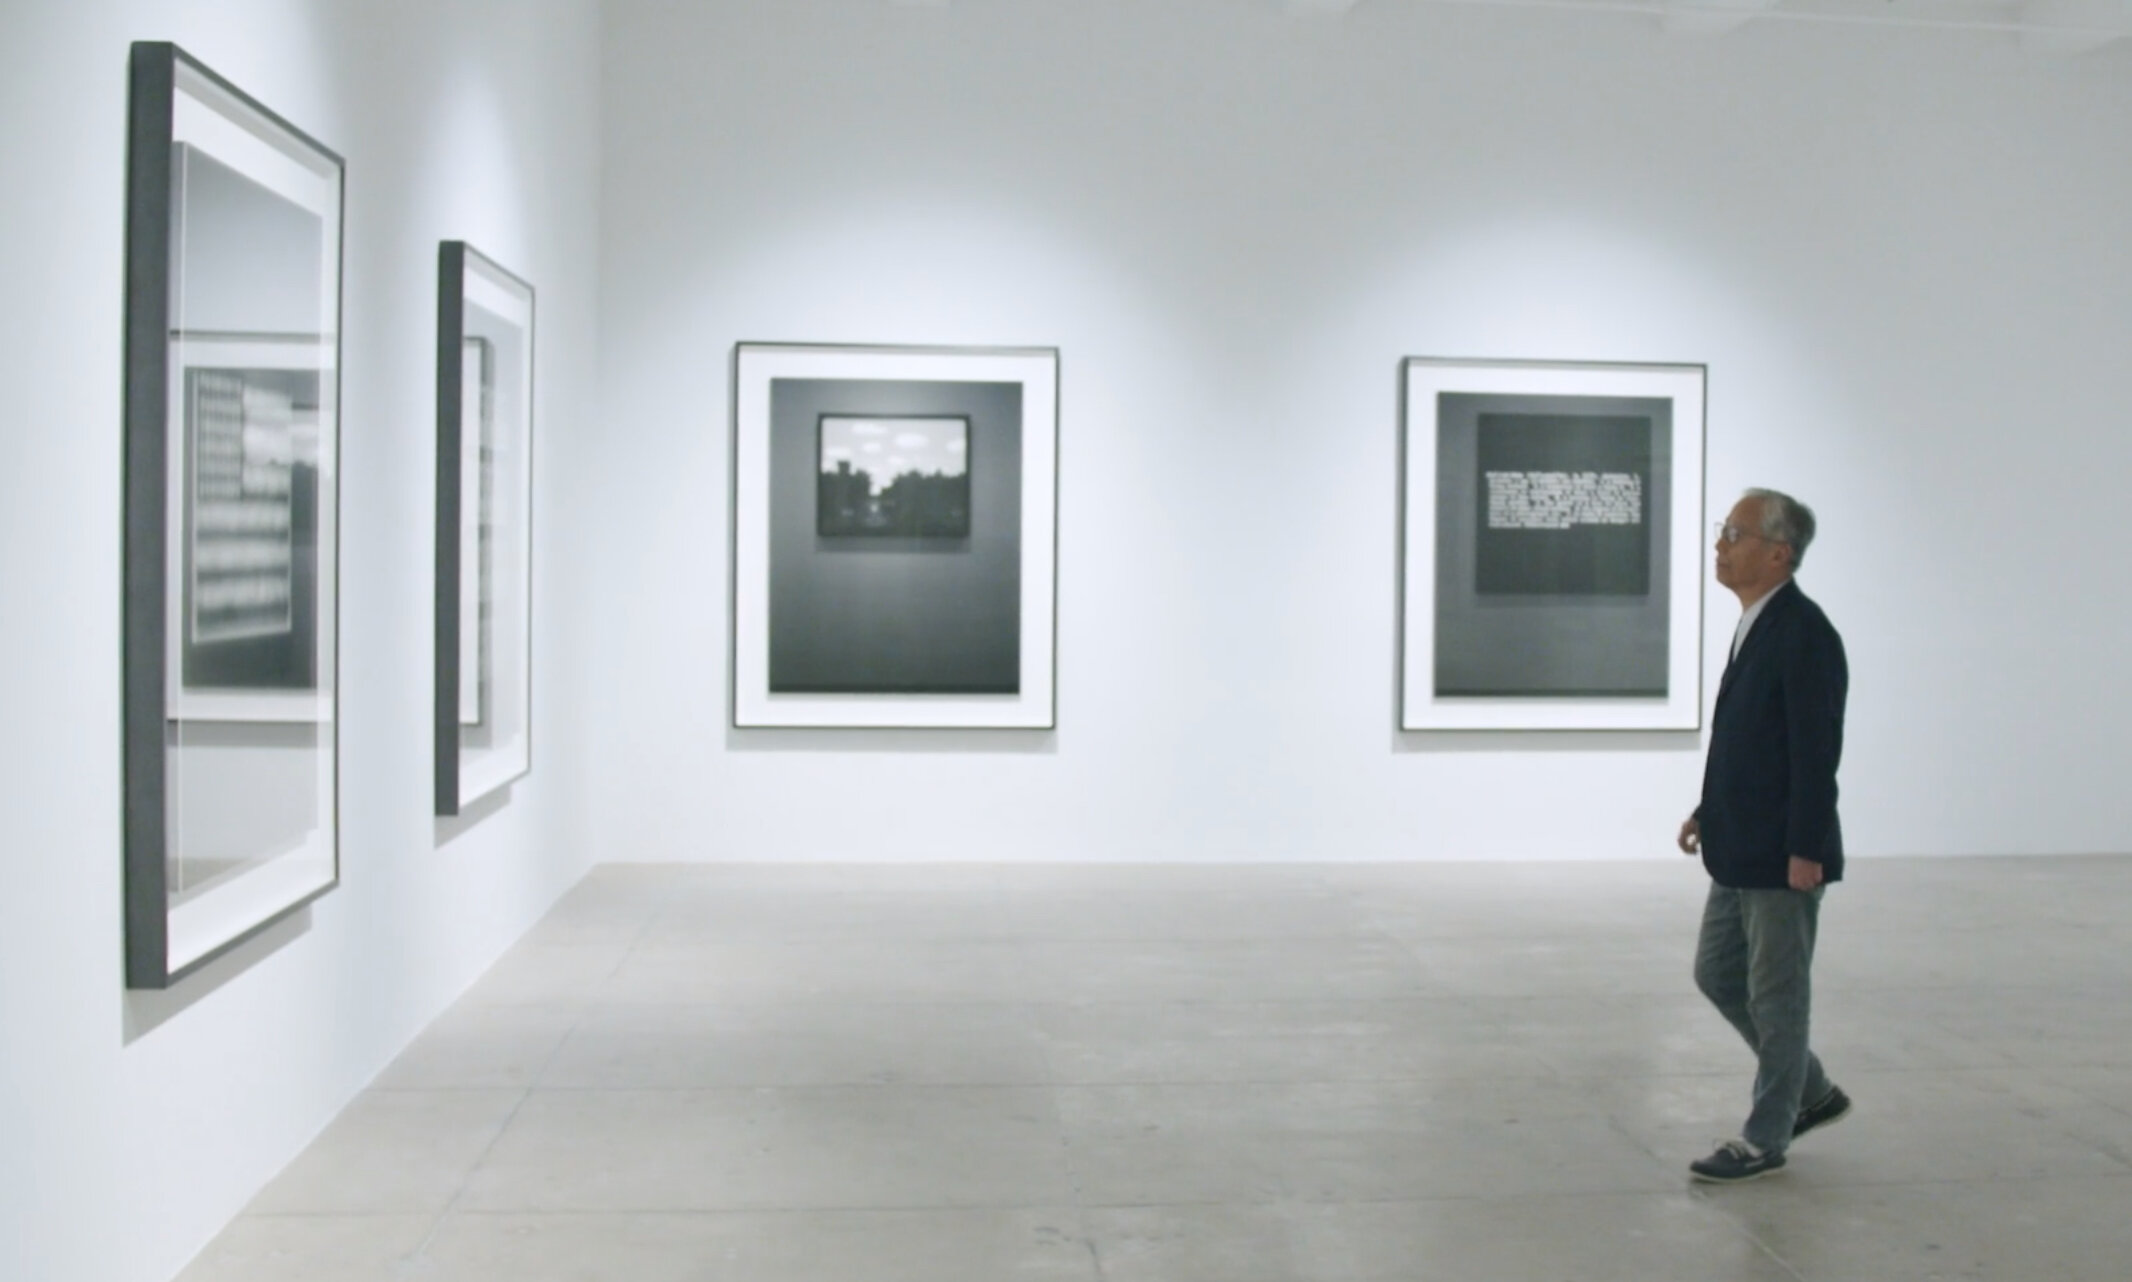 Past Presence Hiroshi Sugimoto on Vimeo